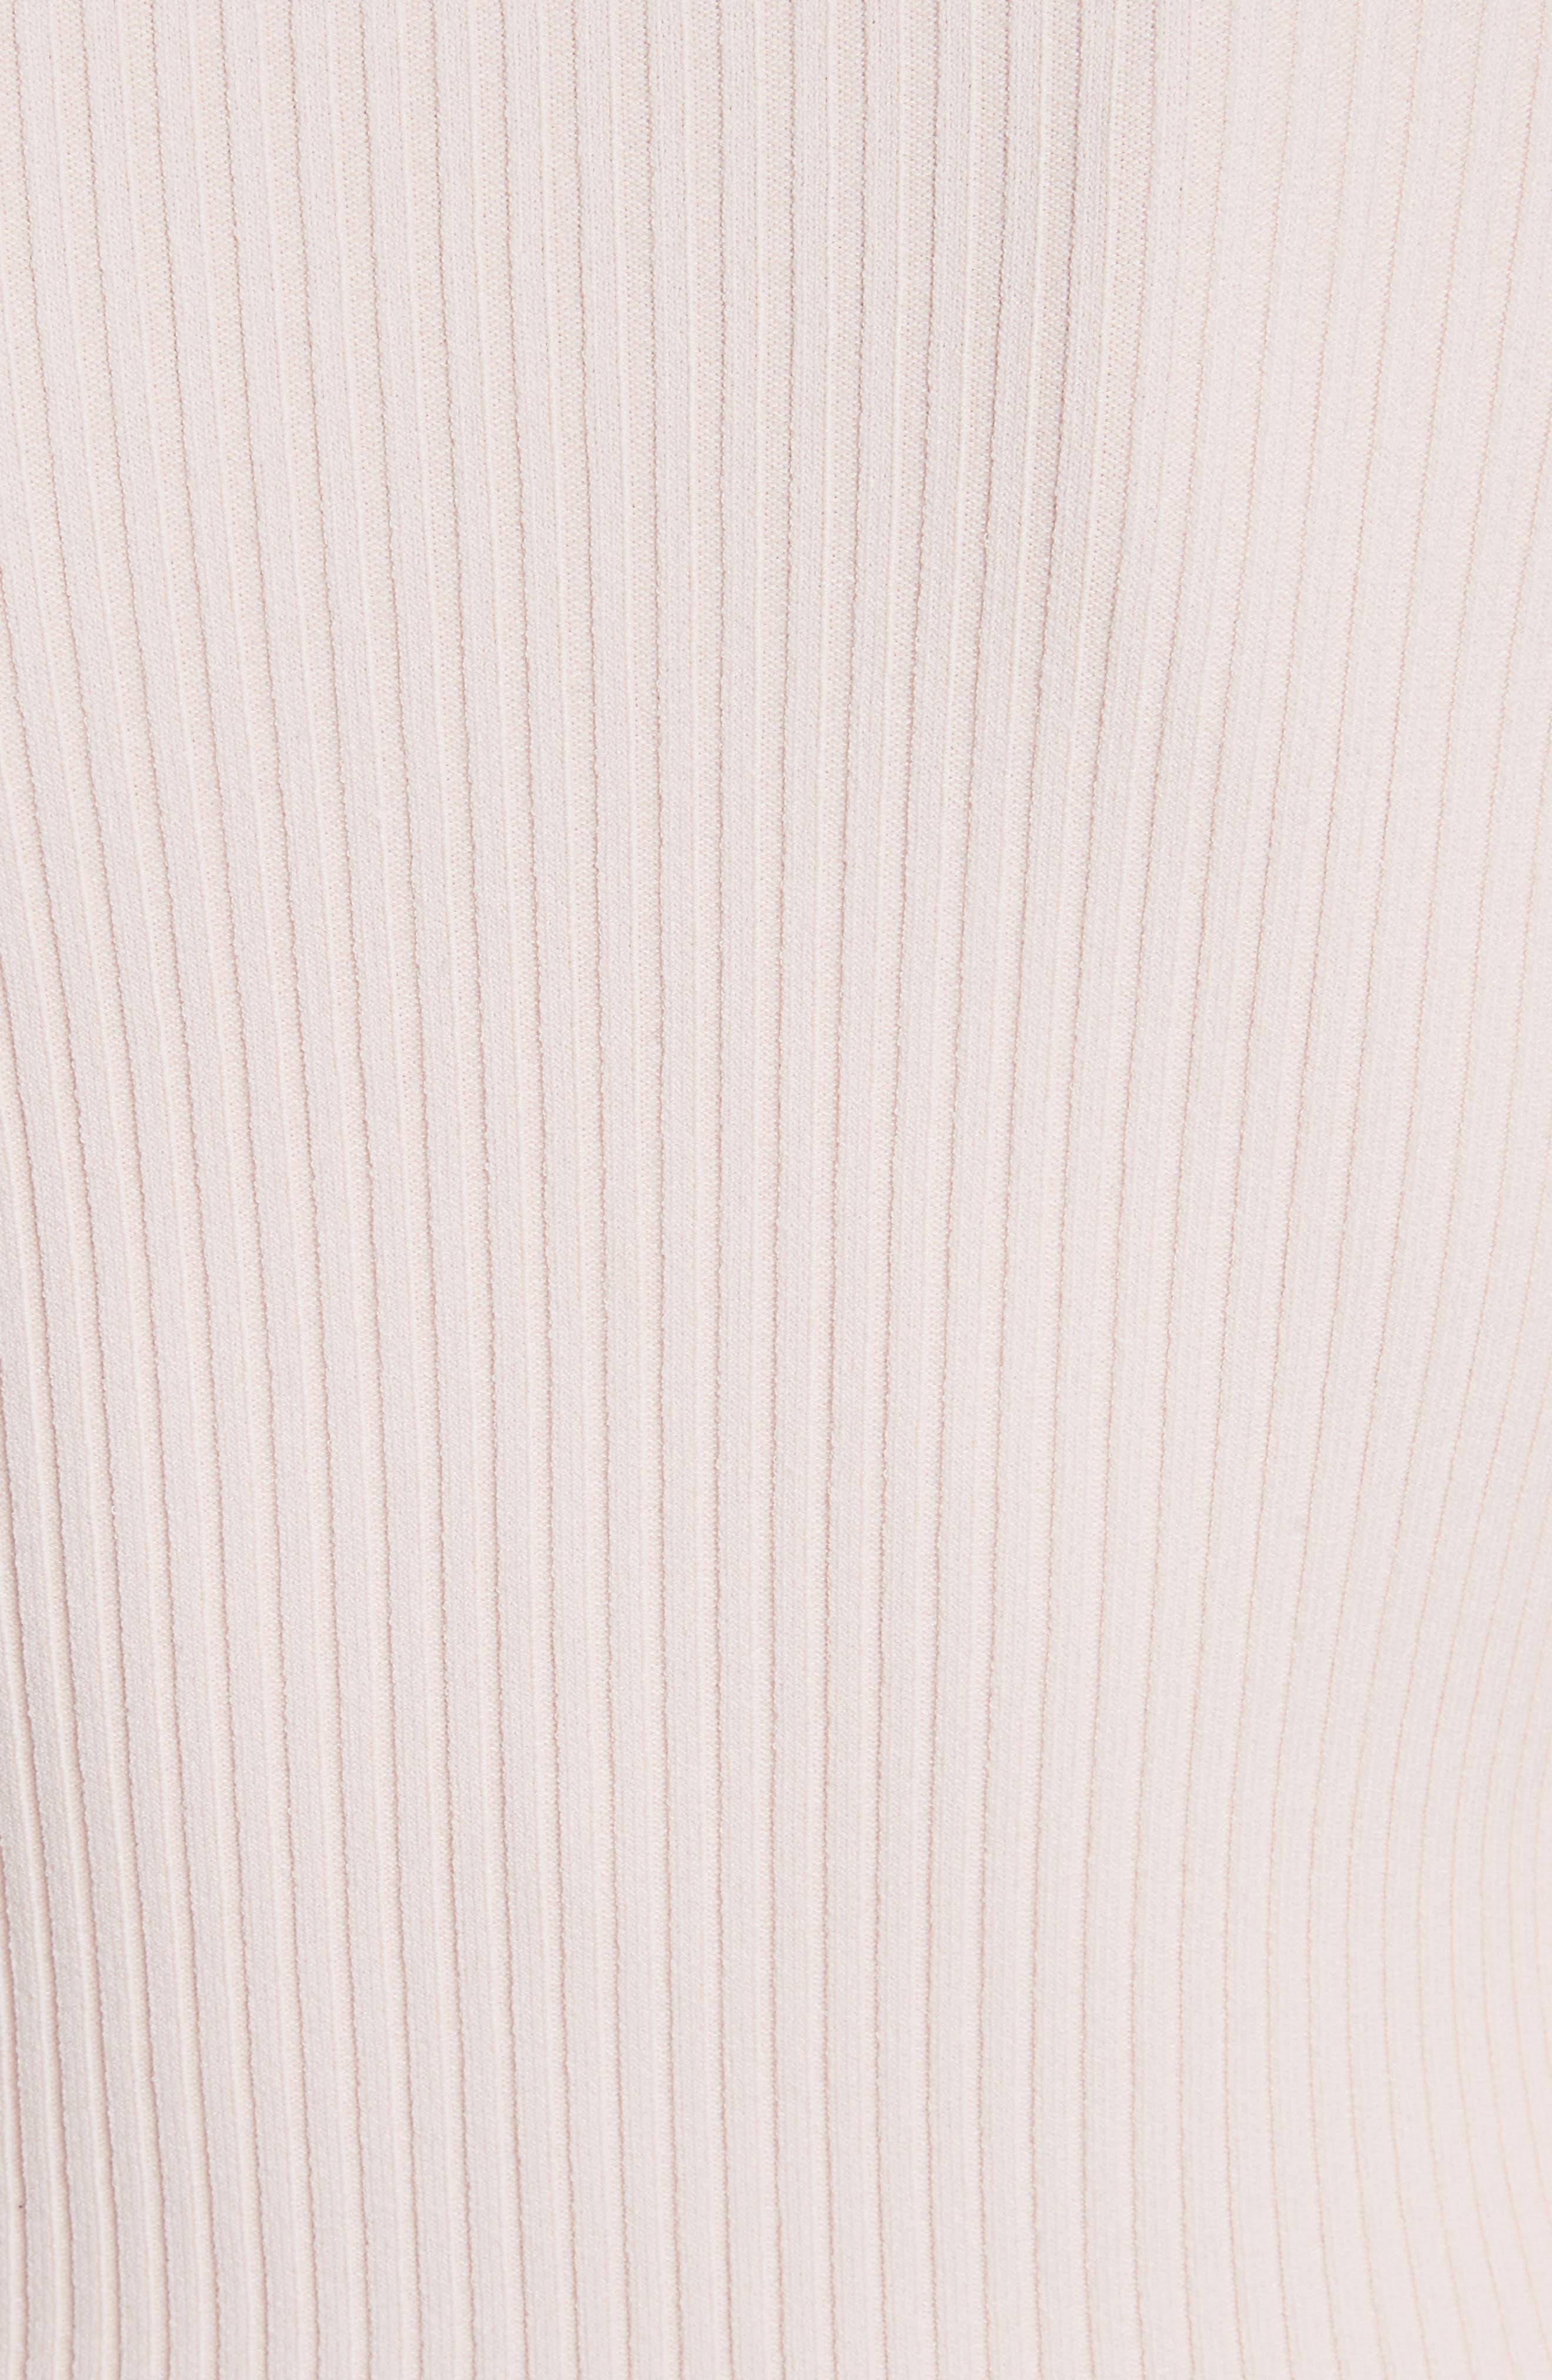 Noya Ruffle Cardigan,                             Alternate thumbnail 5, color,                             Pearl Blush